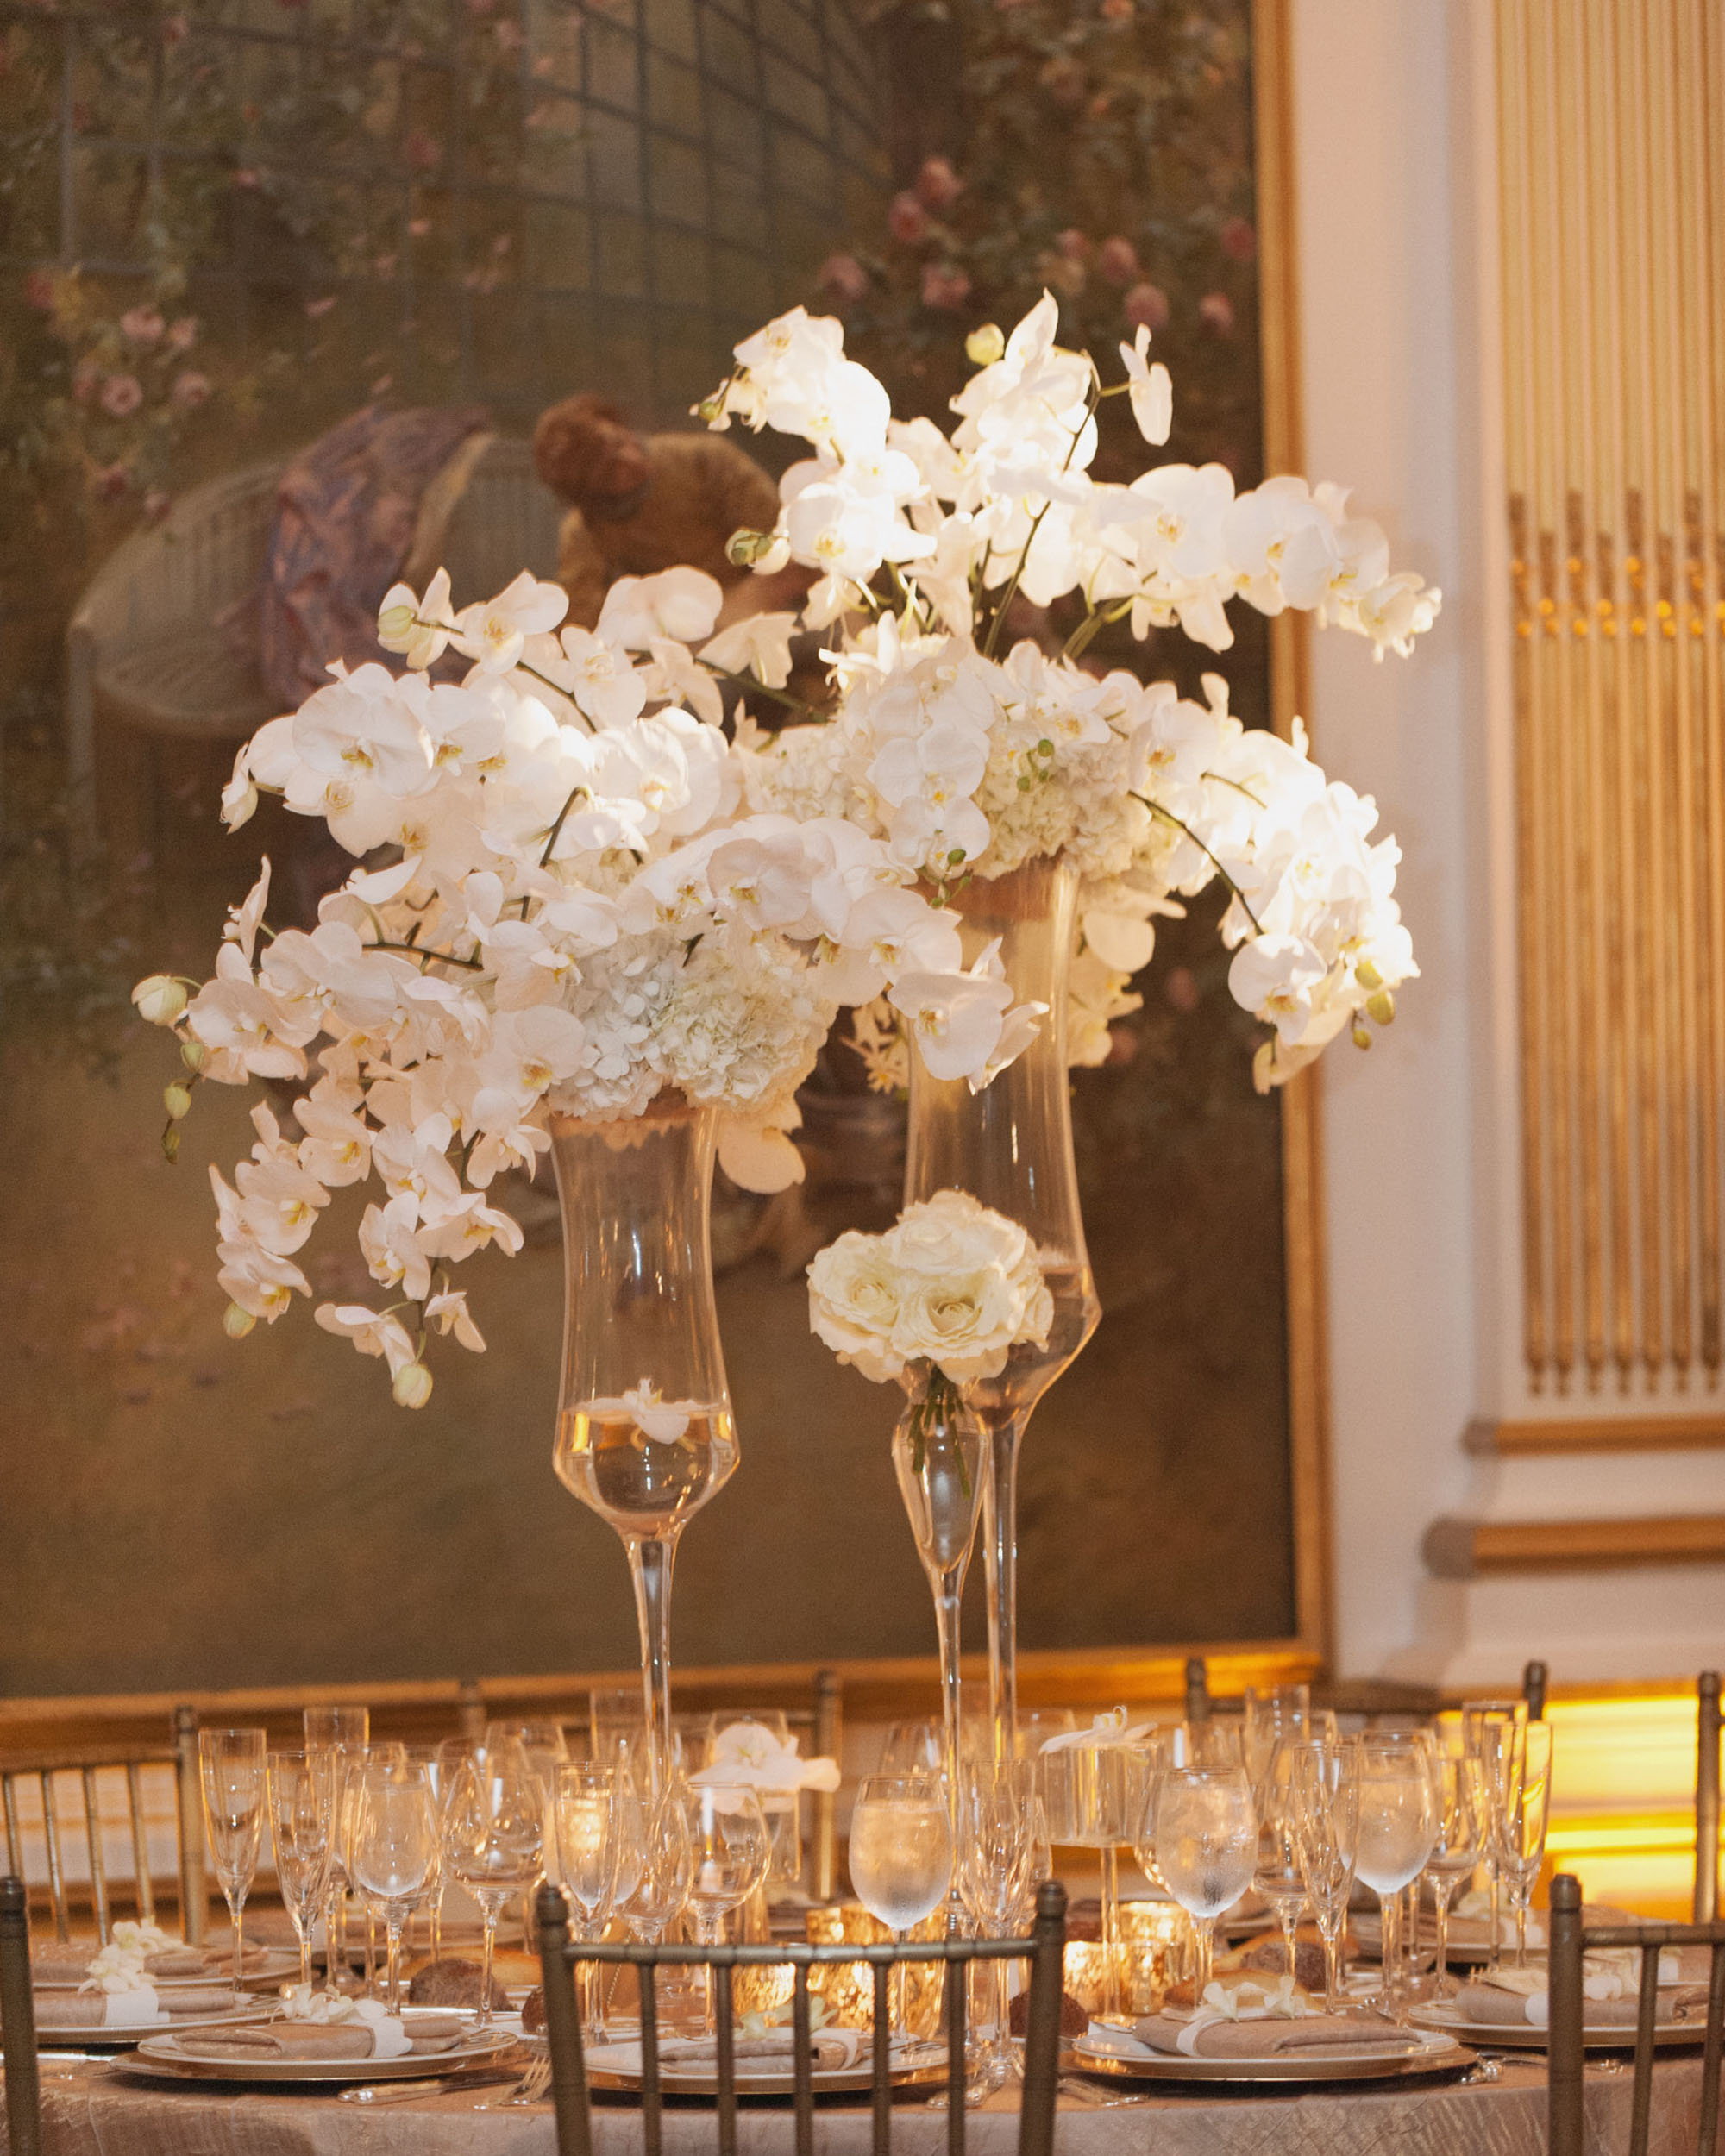 Lotte New York Palace Hotel Wedding Photographer 0020 - Lotte New York Palace Hotel